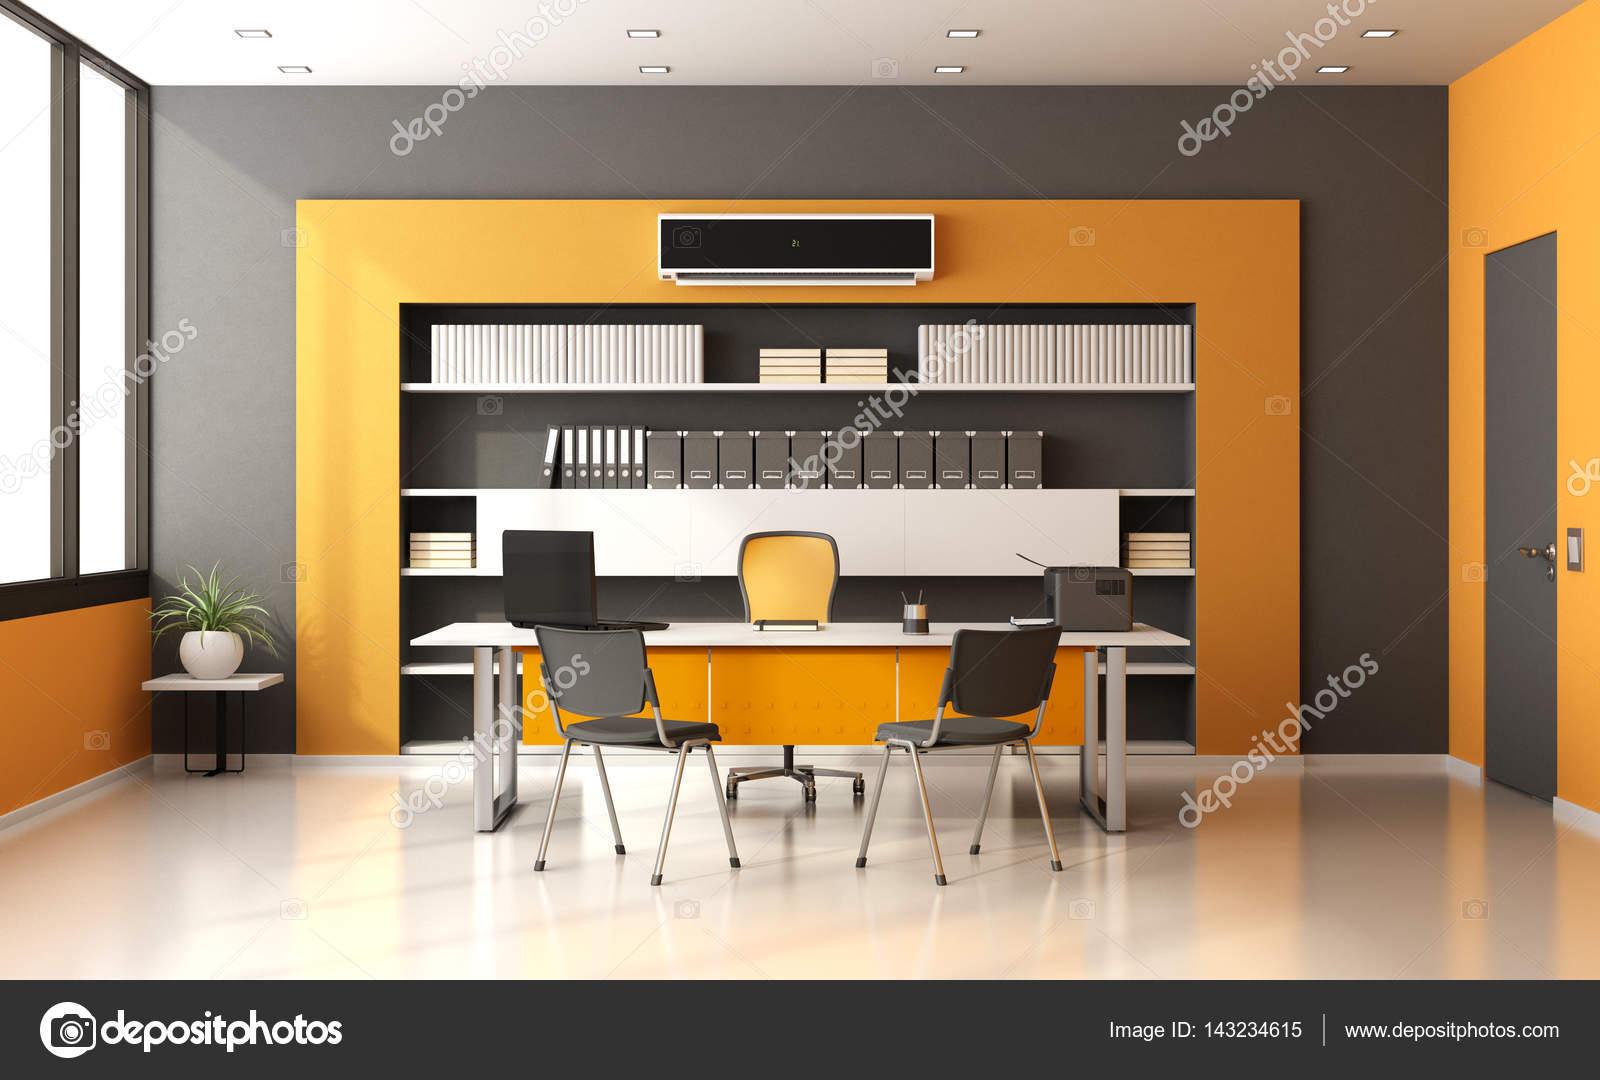 Bureau moderne orange et gris u2014 photographie archideaphoto © #143234615